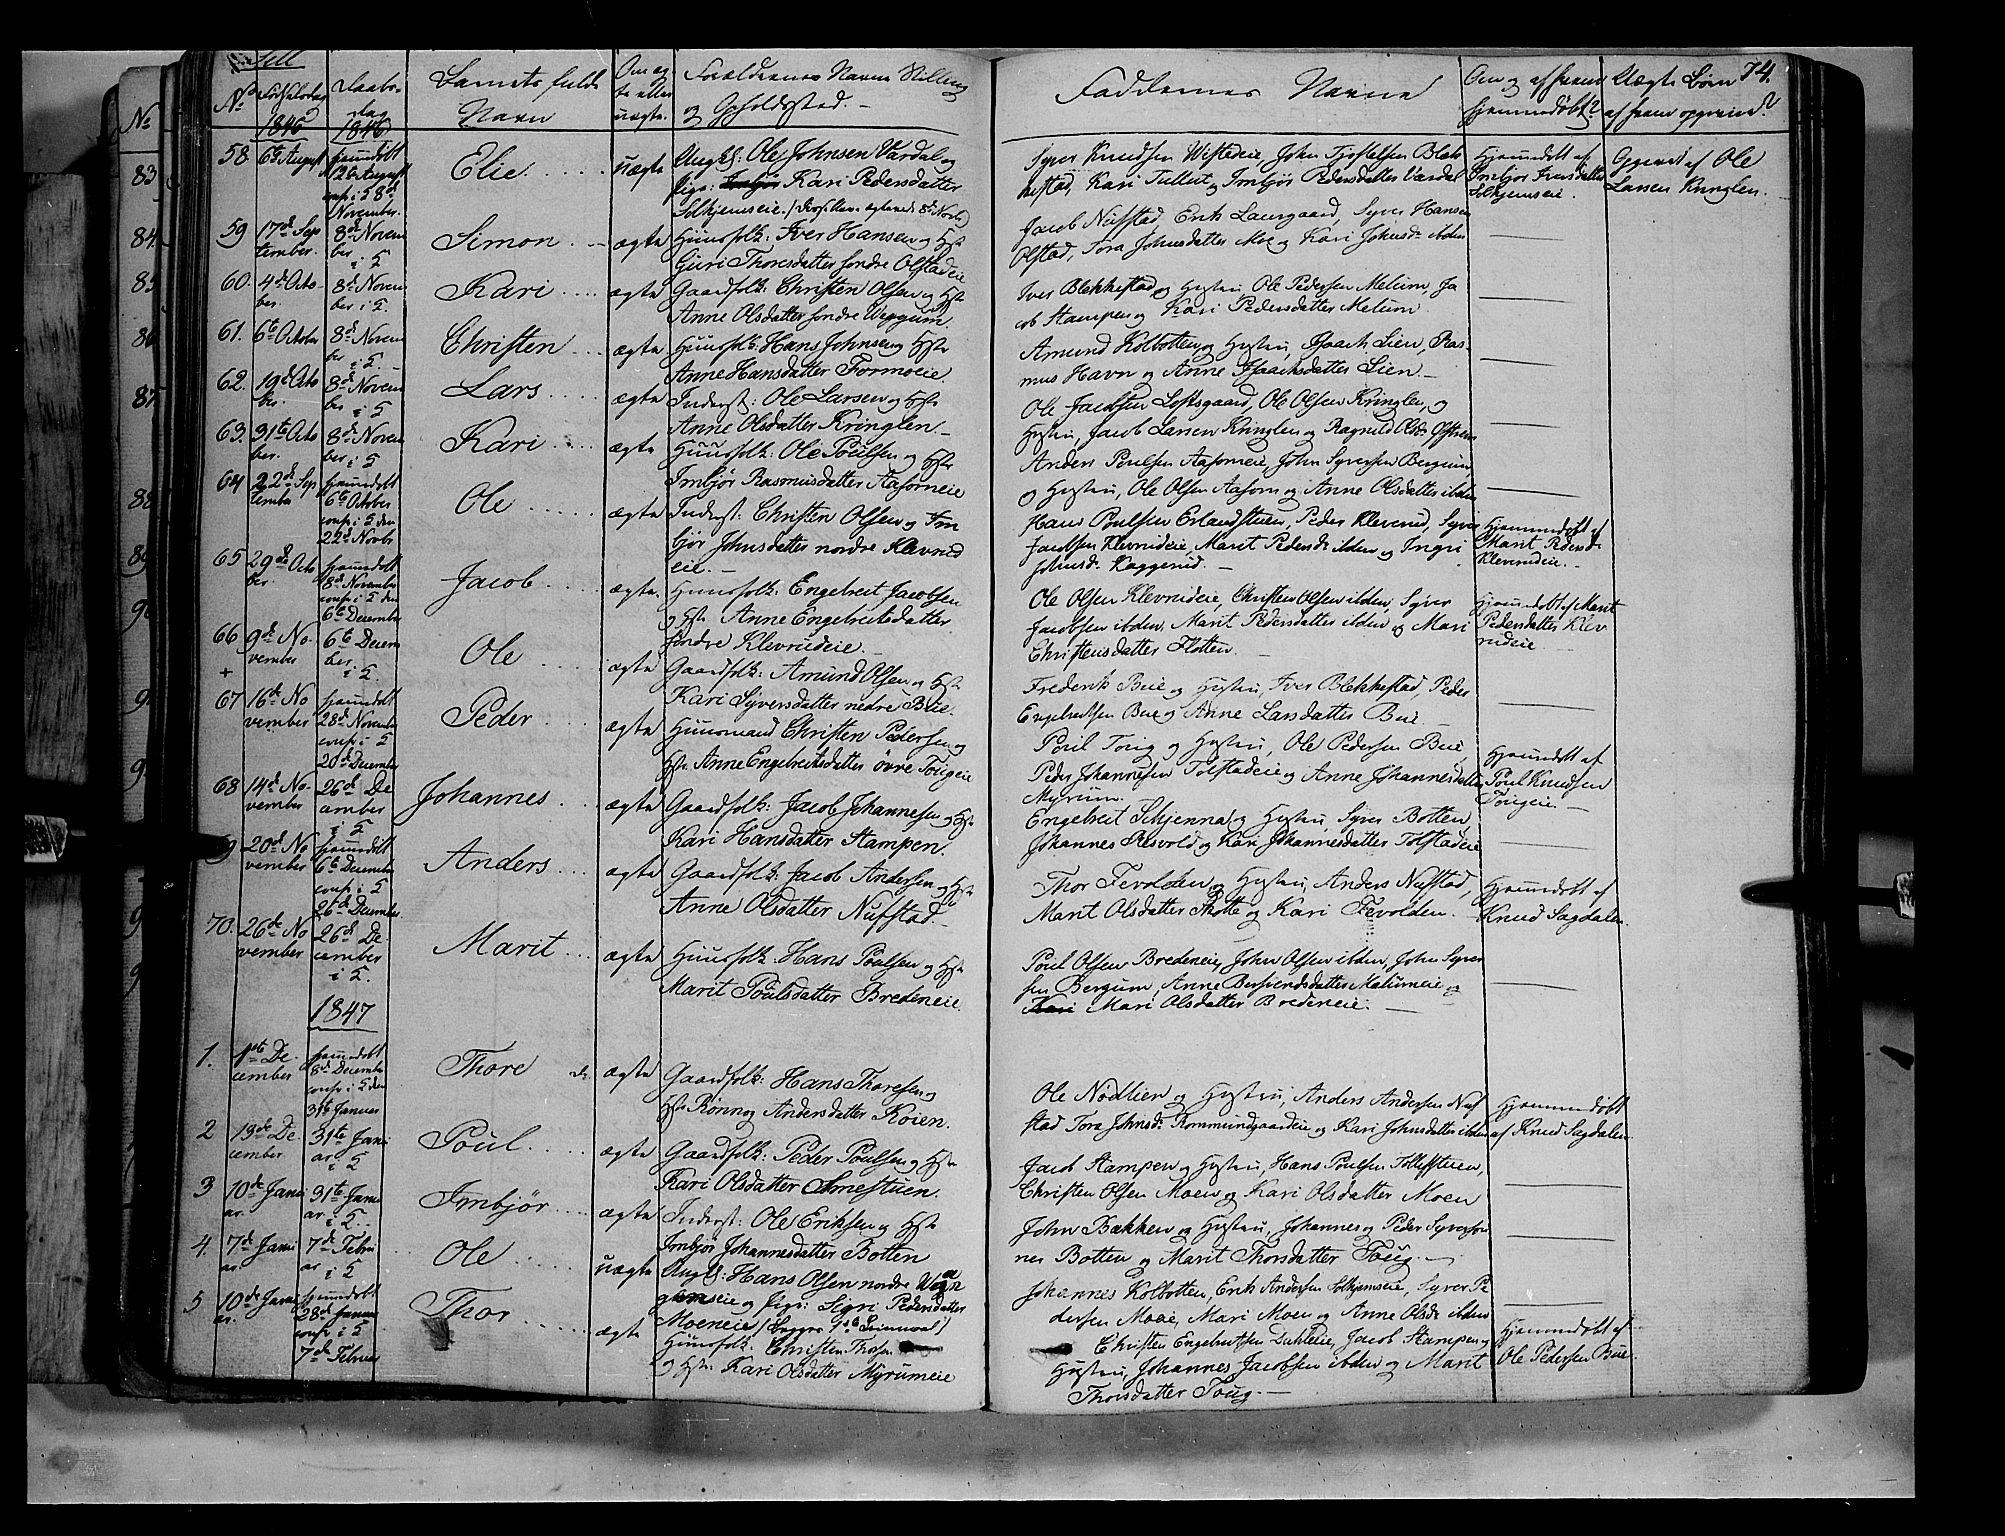 SAH, Vågå prestekontor, Ministerialbok nr. 5 /3, 1842-1856, s. 74